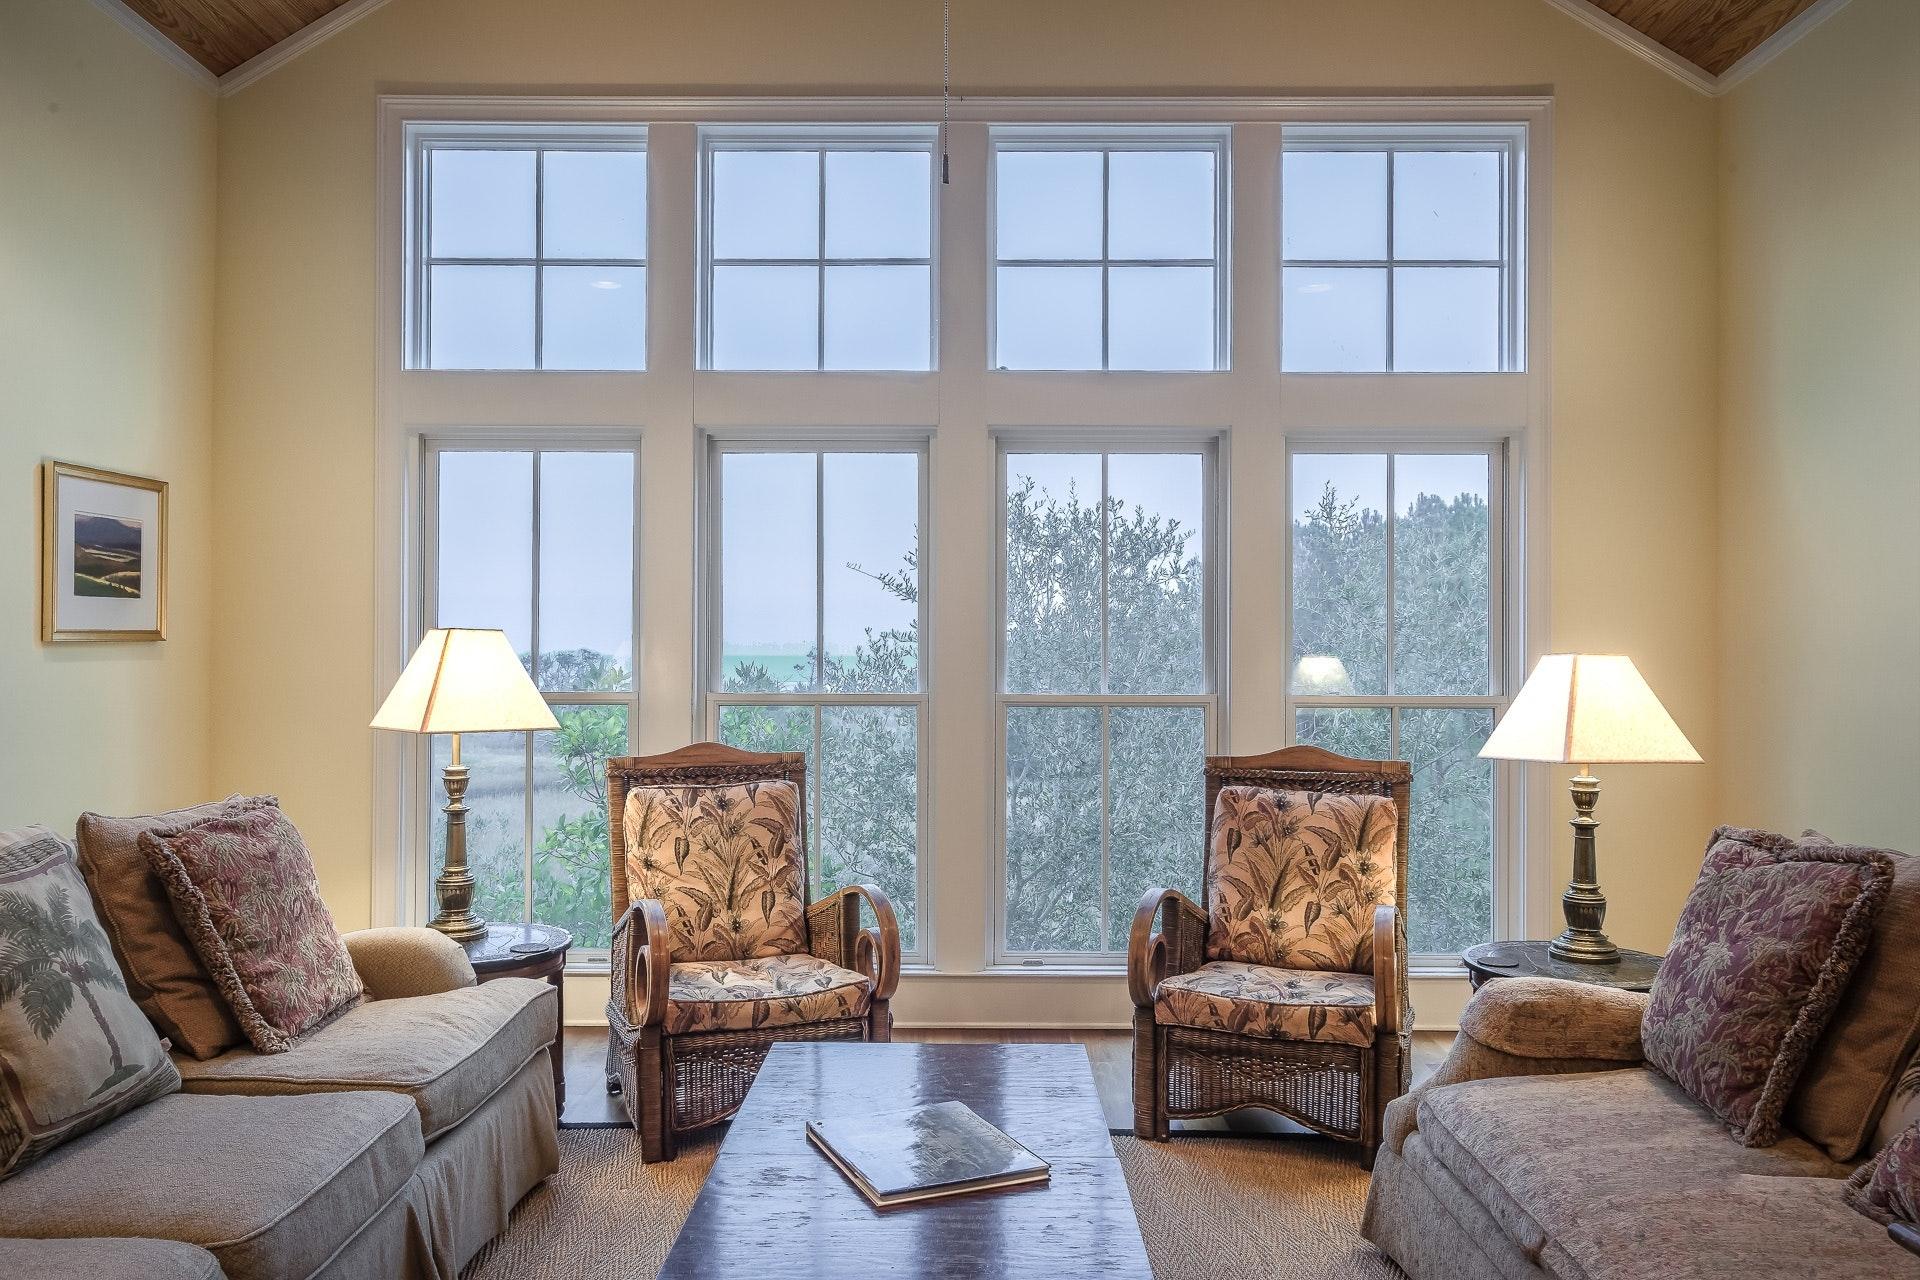 window-replacement-questions-home-contractors-exterior.jpg